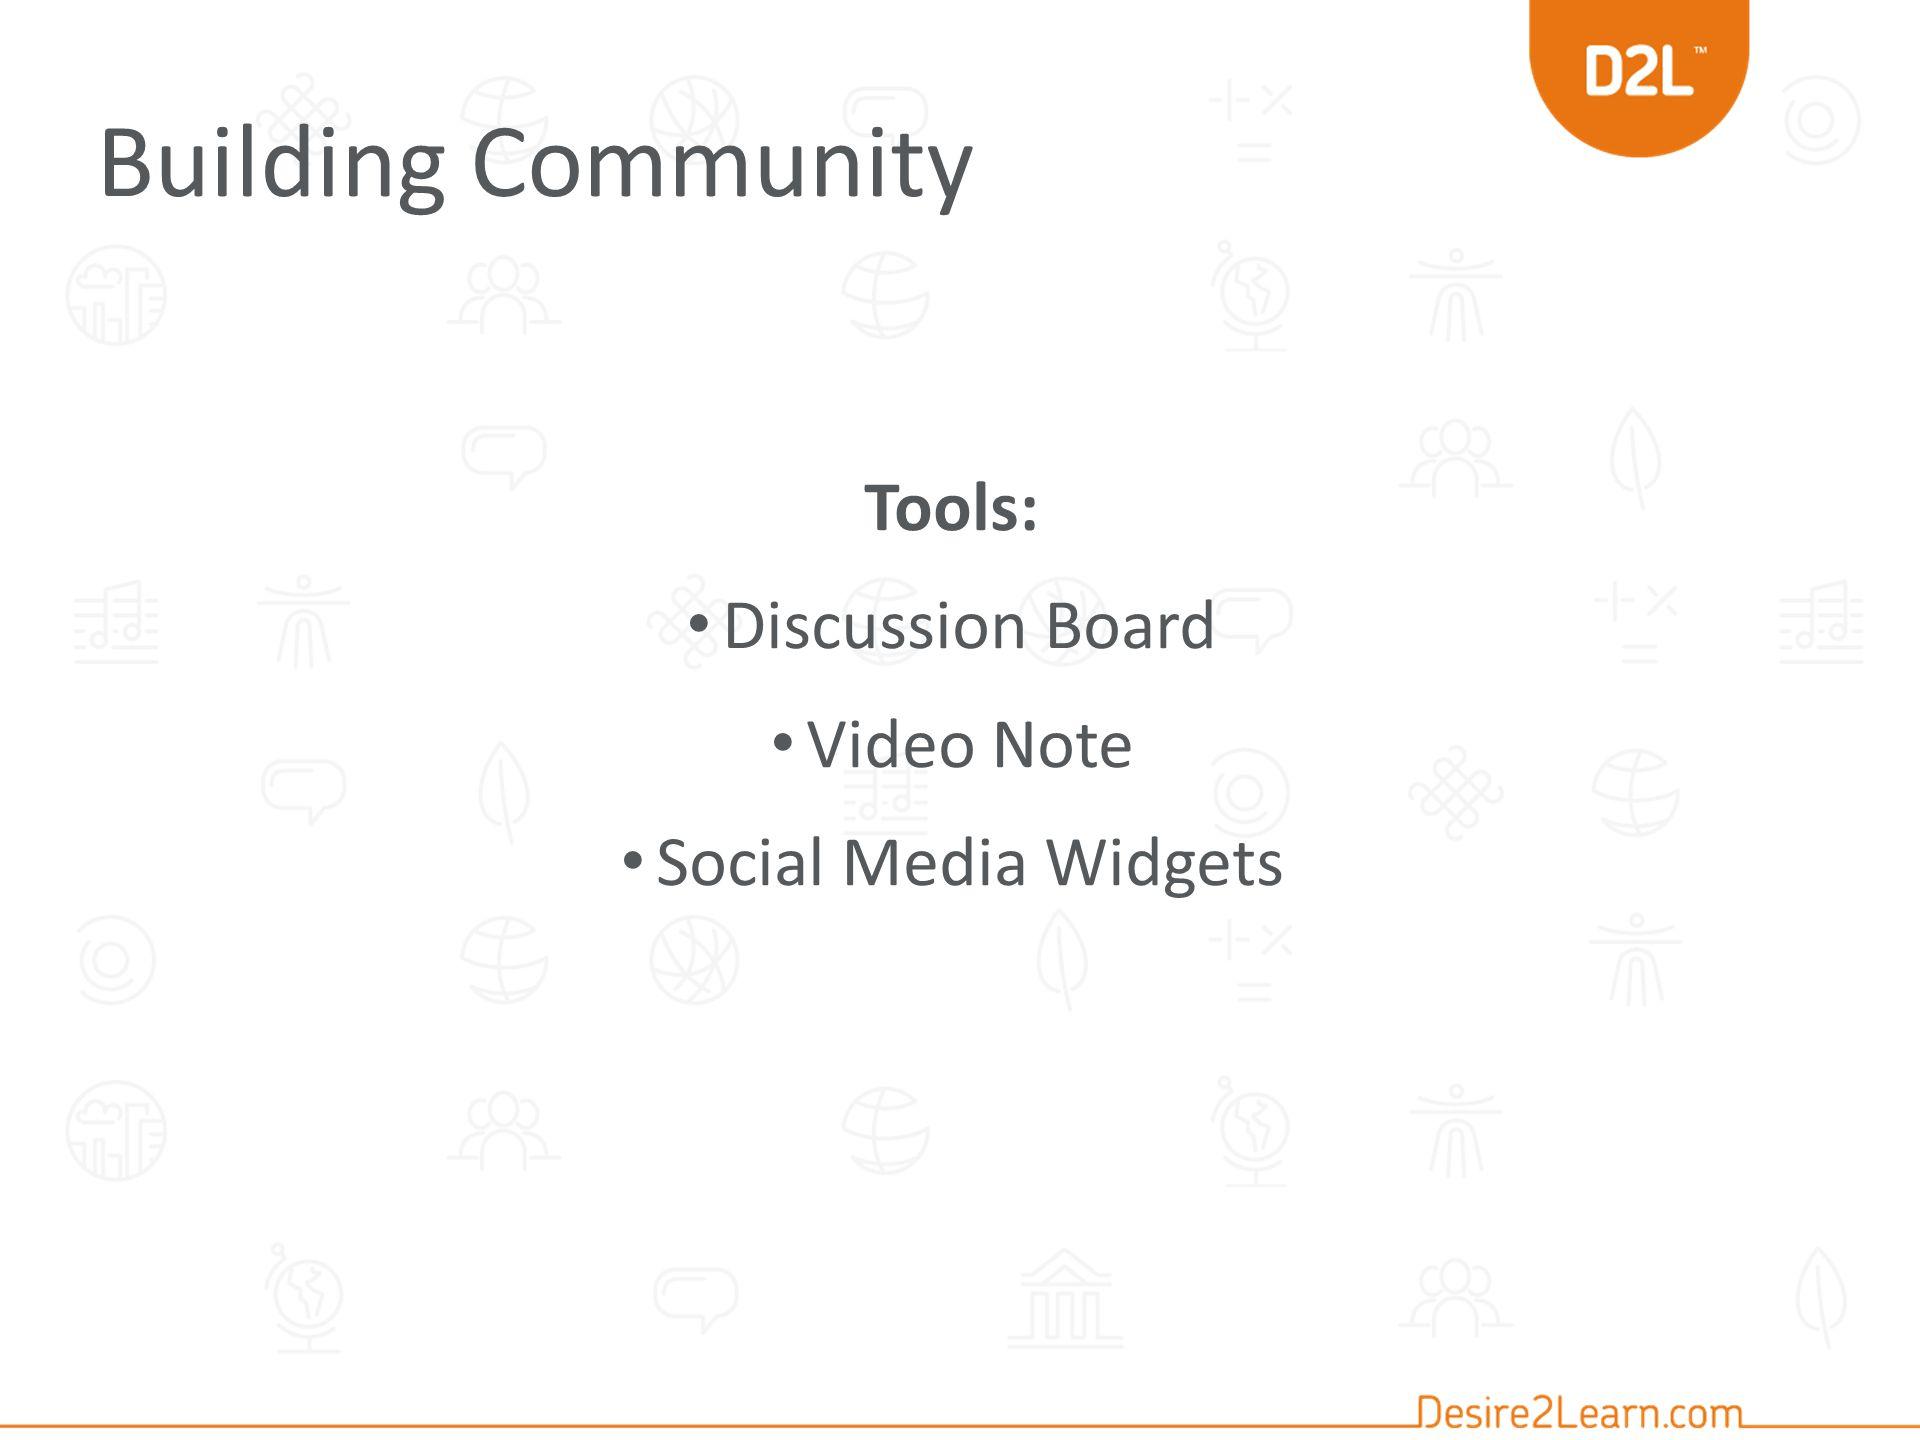 Building Community Tools: Discussion Board Video Note Social Media Widgets